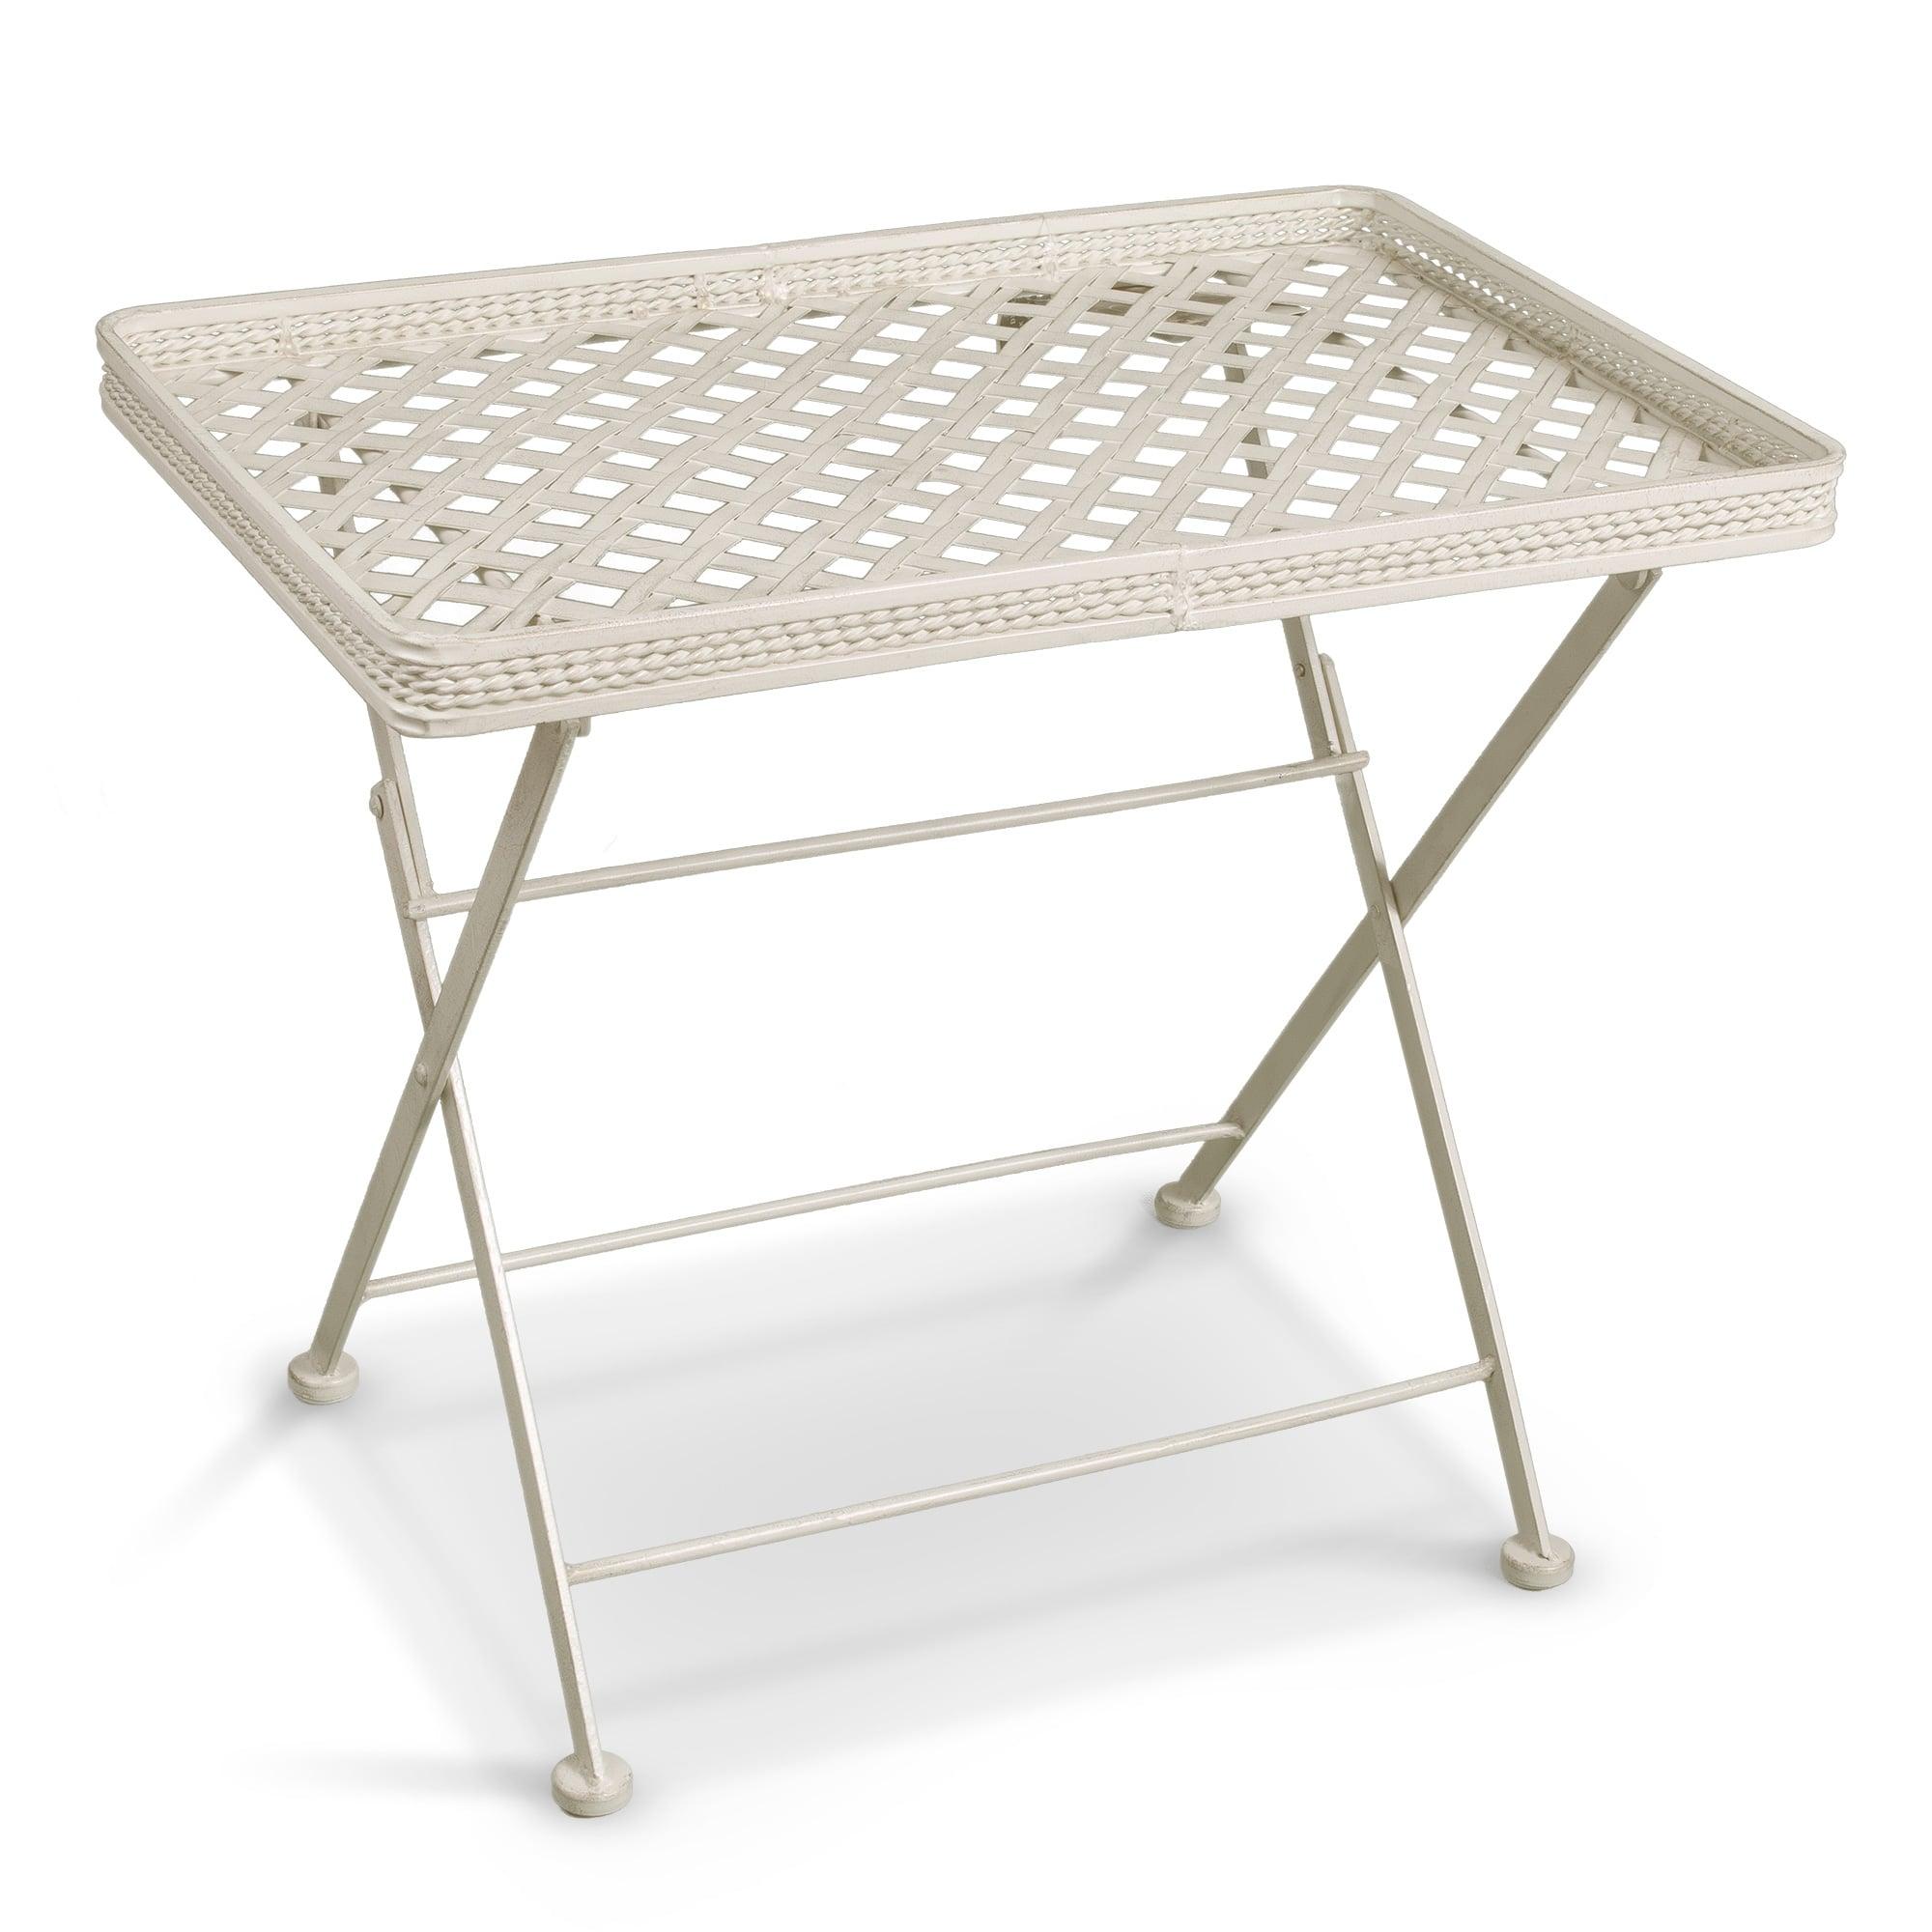 - Cassis Matt Cream Metal Folding Patio Butler's Tray Side Table